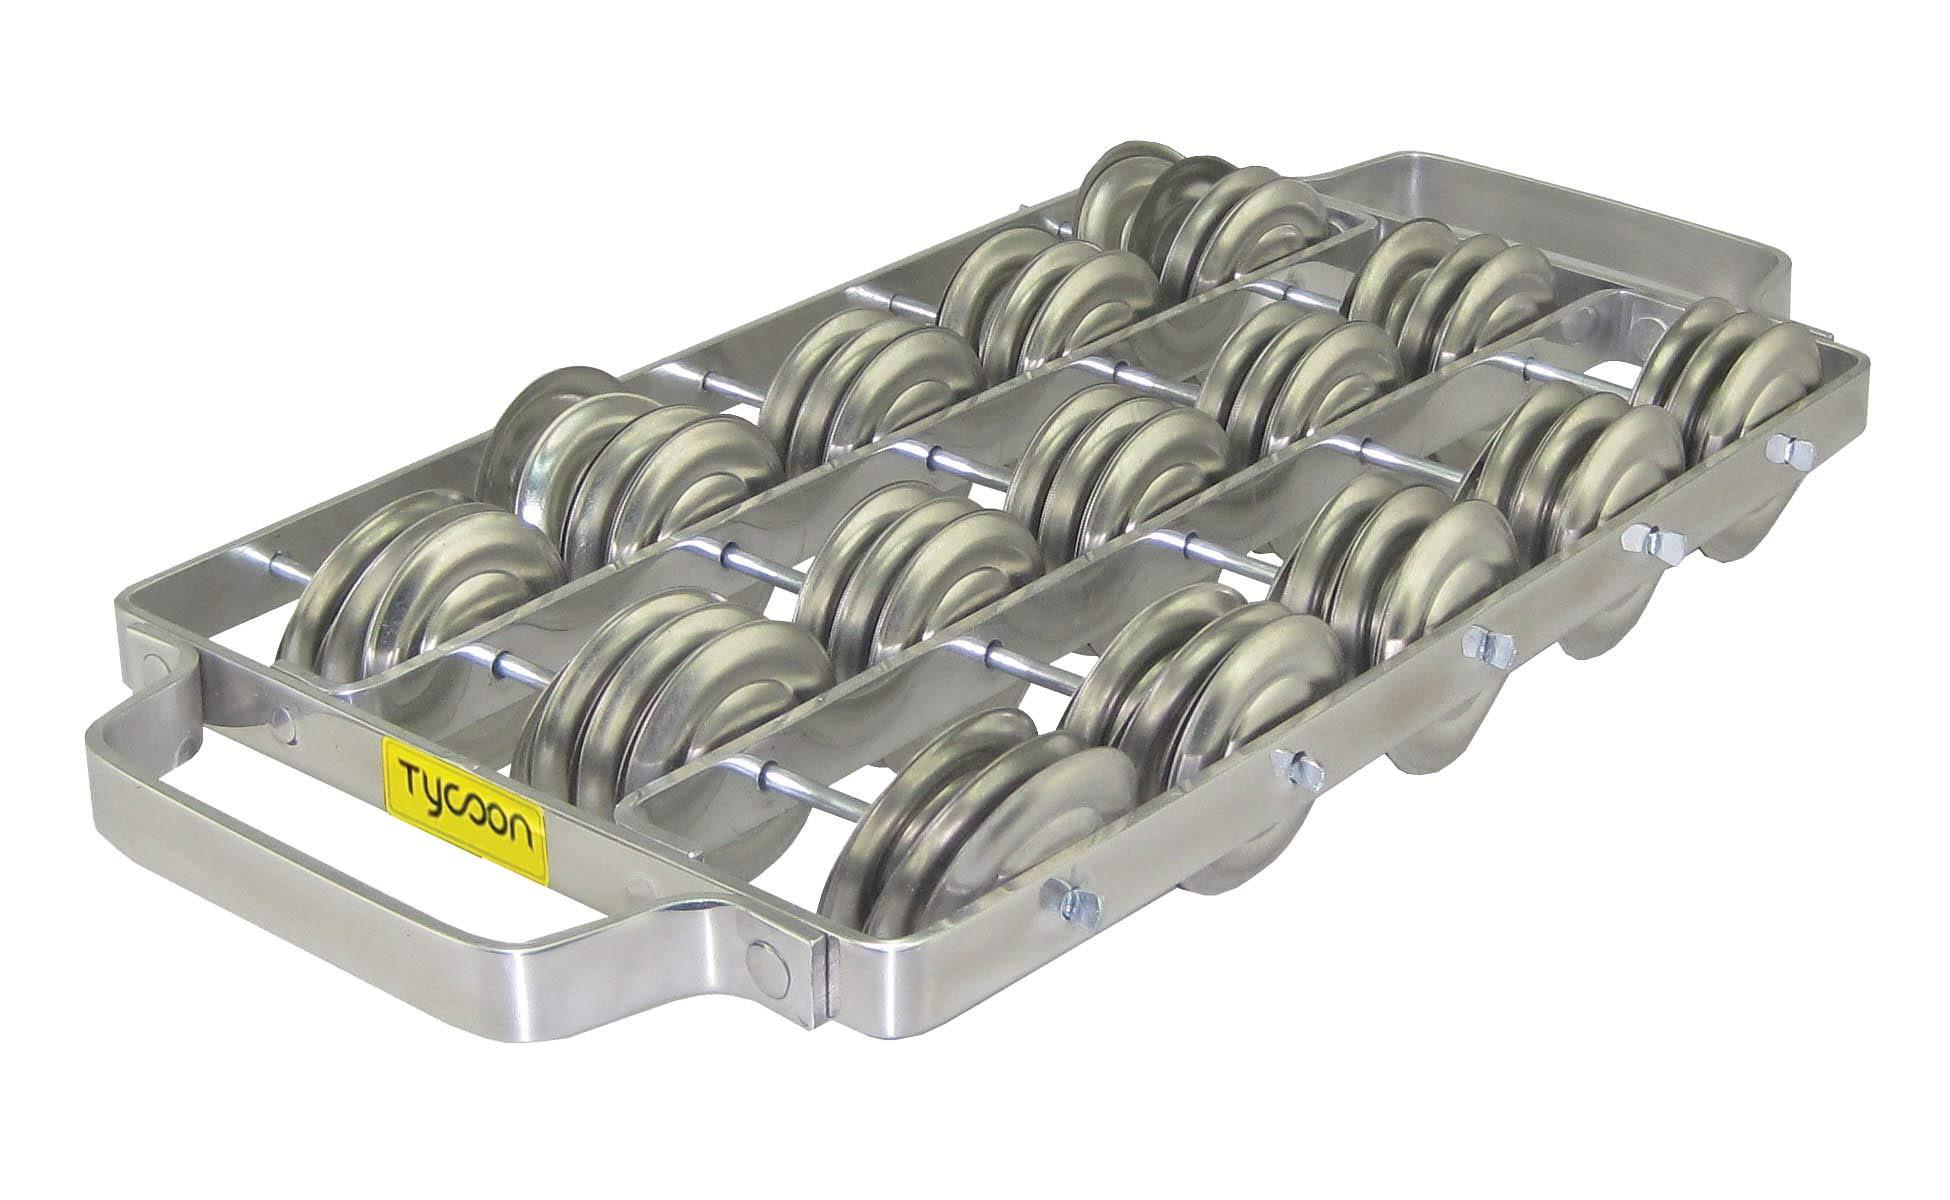 Tycoon Percussion TPCH Aluminum Chocalho